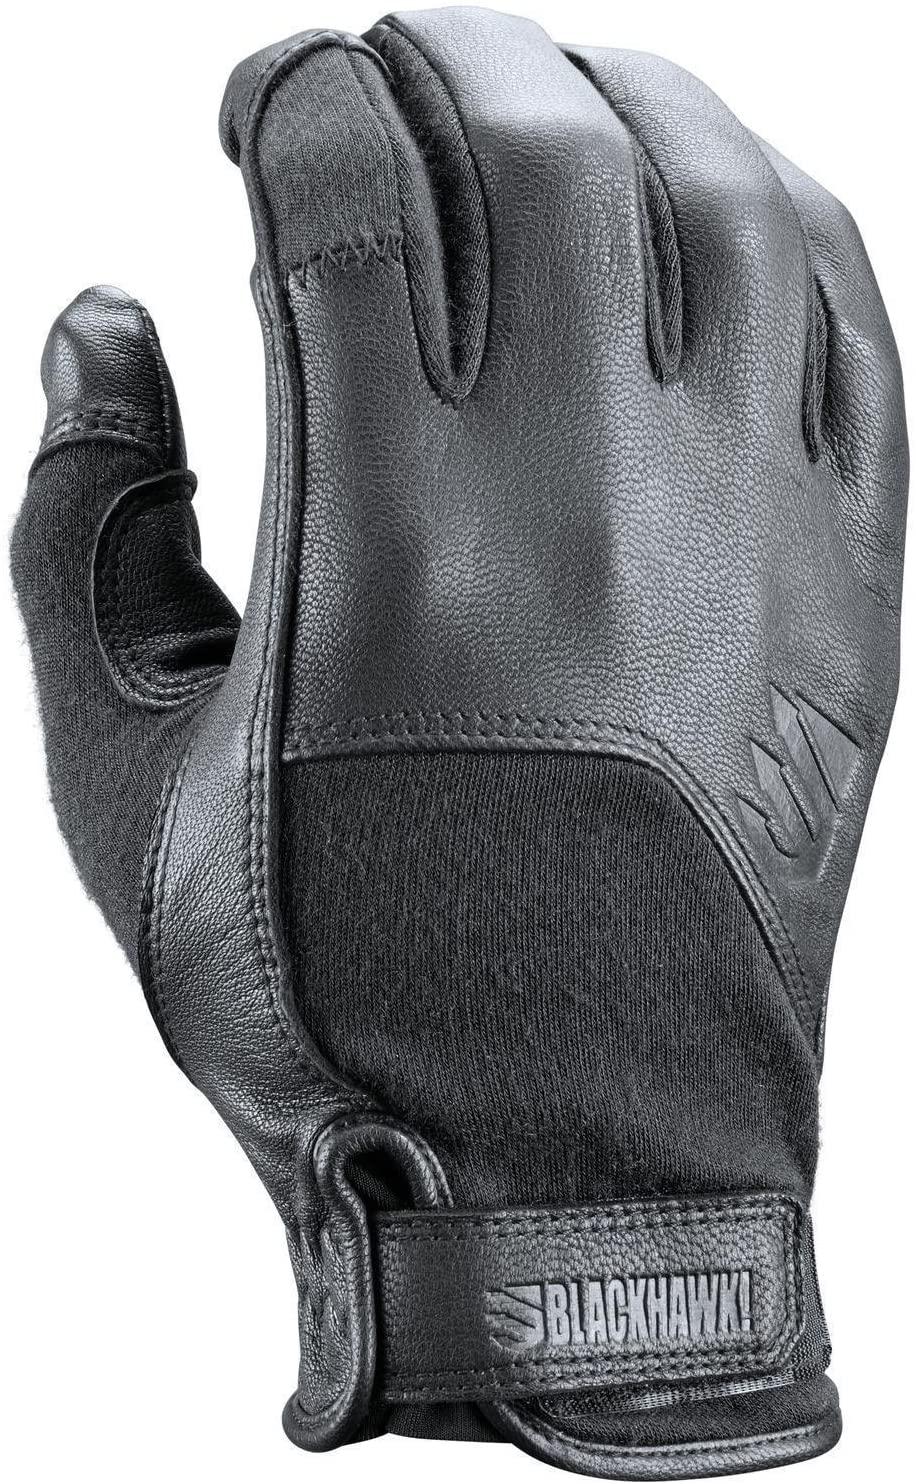 BLACKHAWK! Gt009Bklg Aviator Glove, Black, Large